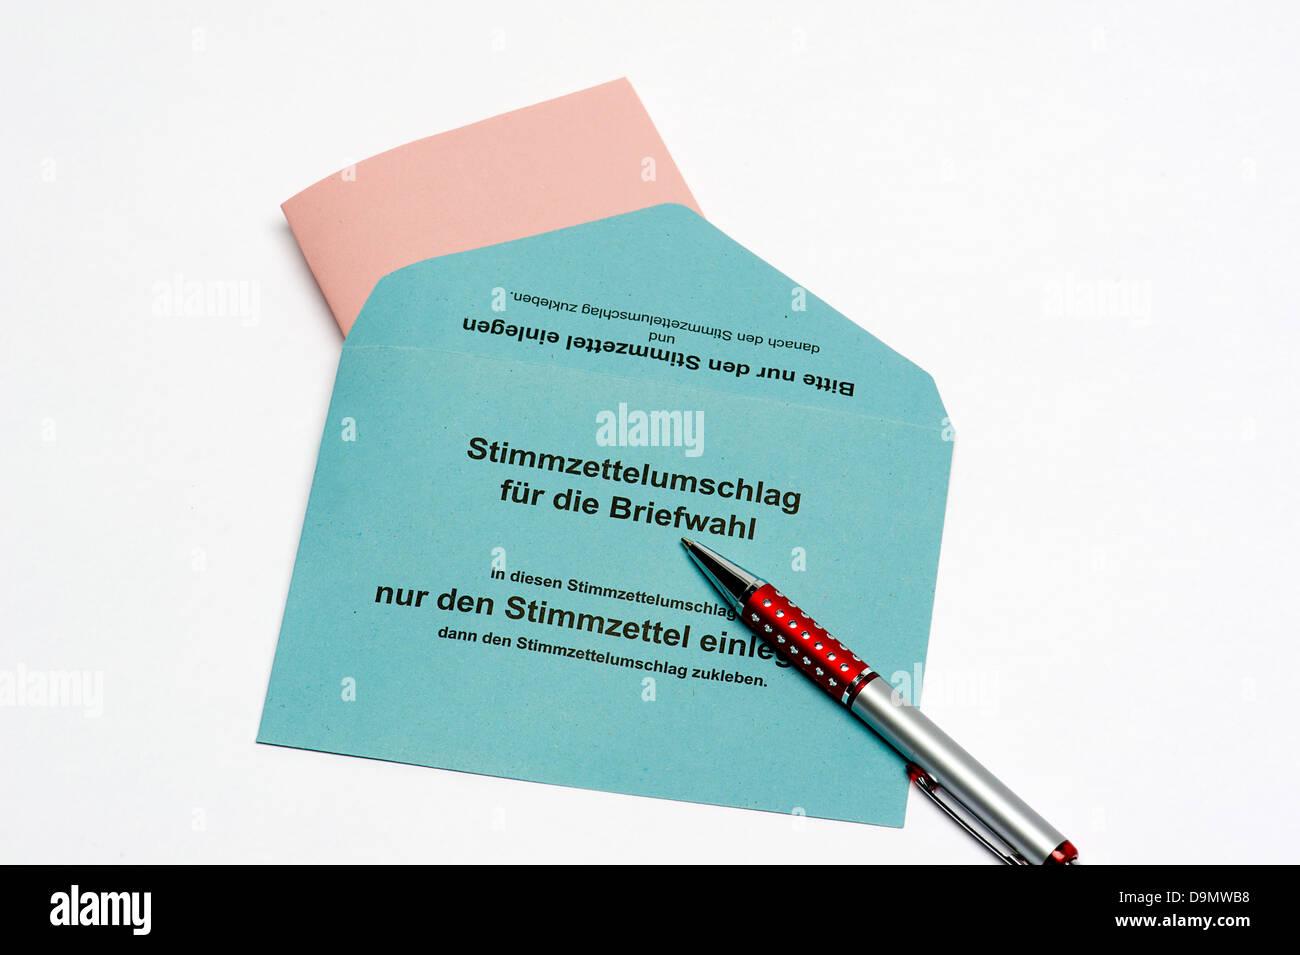 postal vote application form nsw